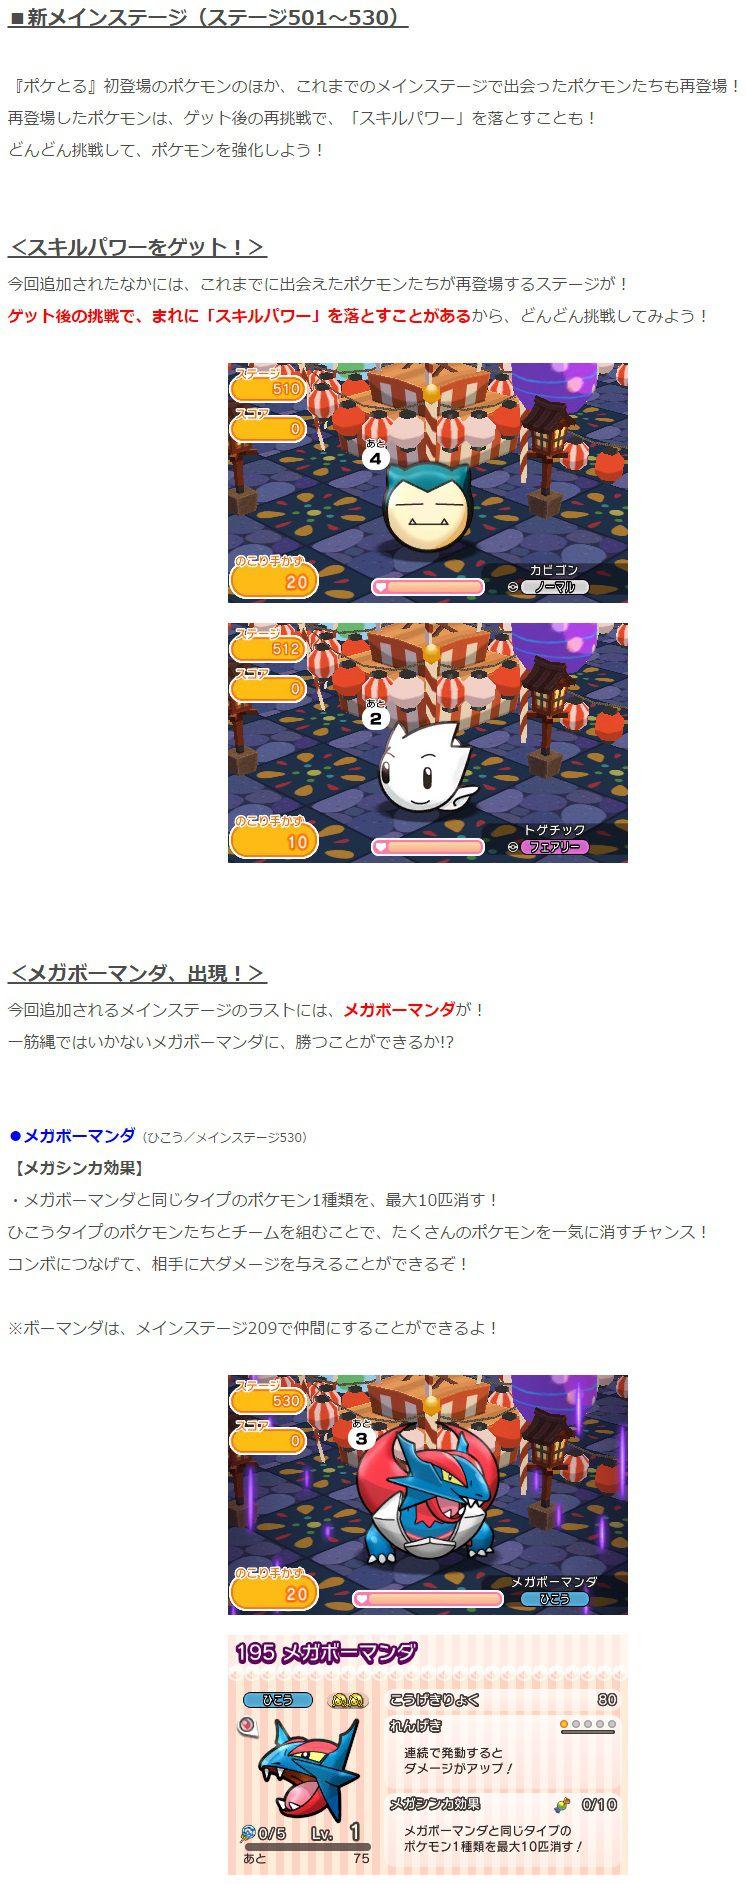 image_7652.jpg